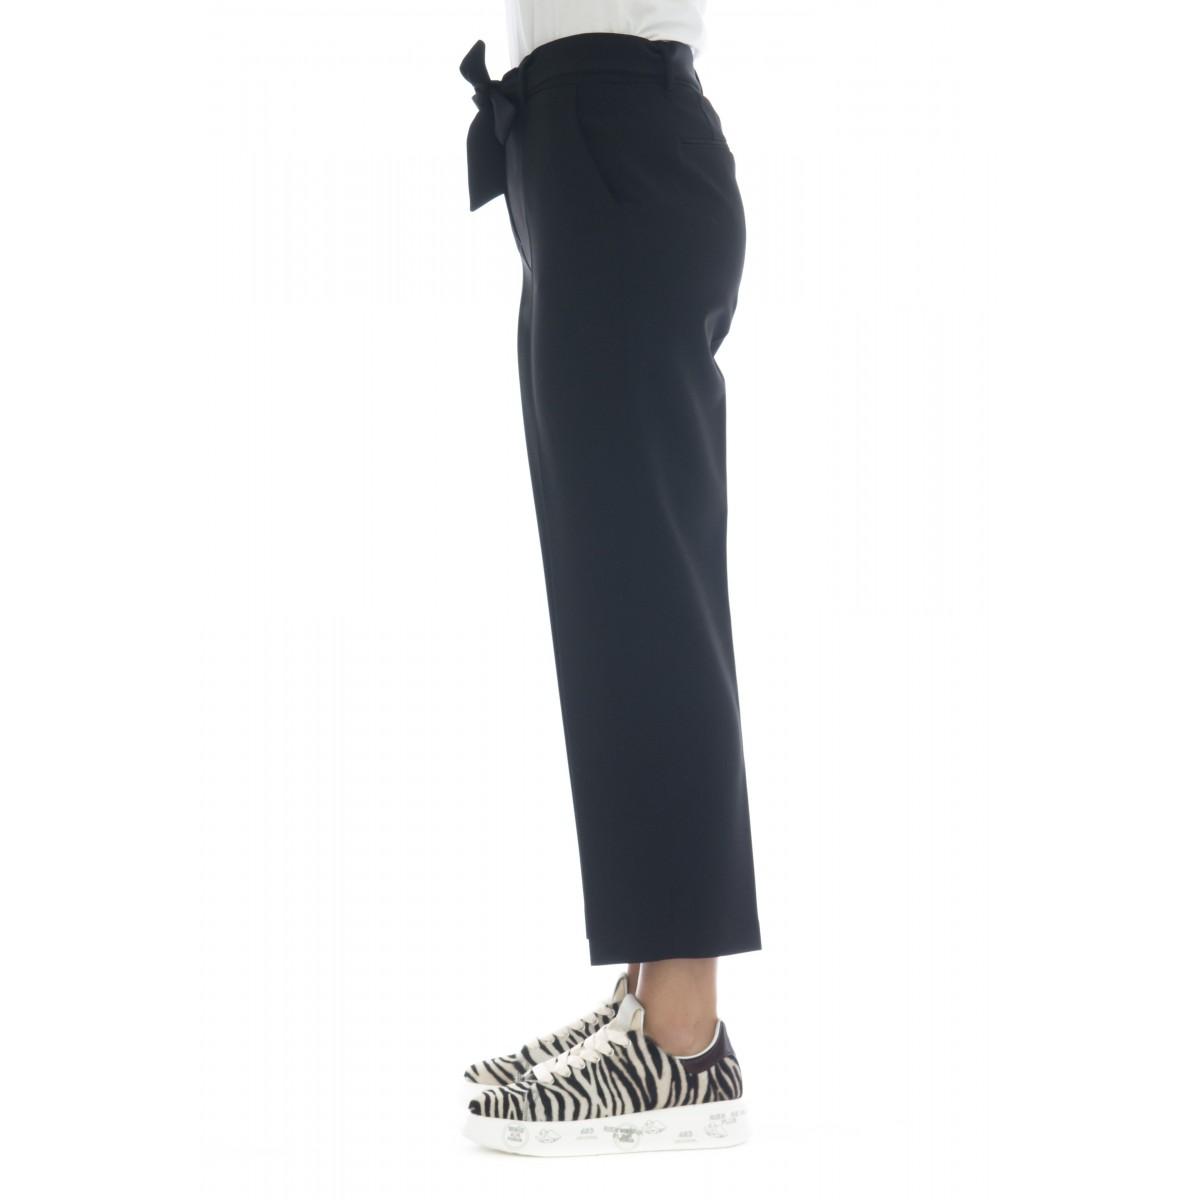 Pantalone donna - Tay pantalone